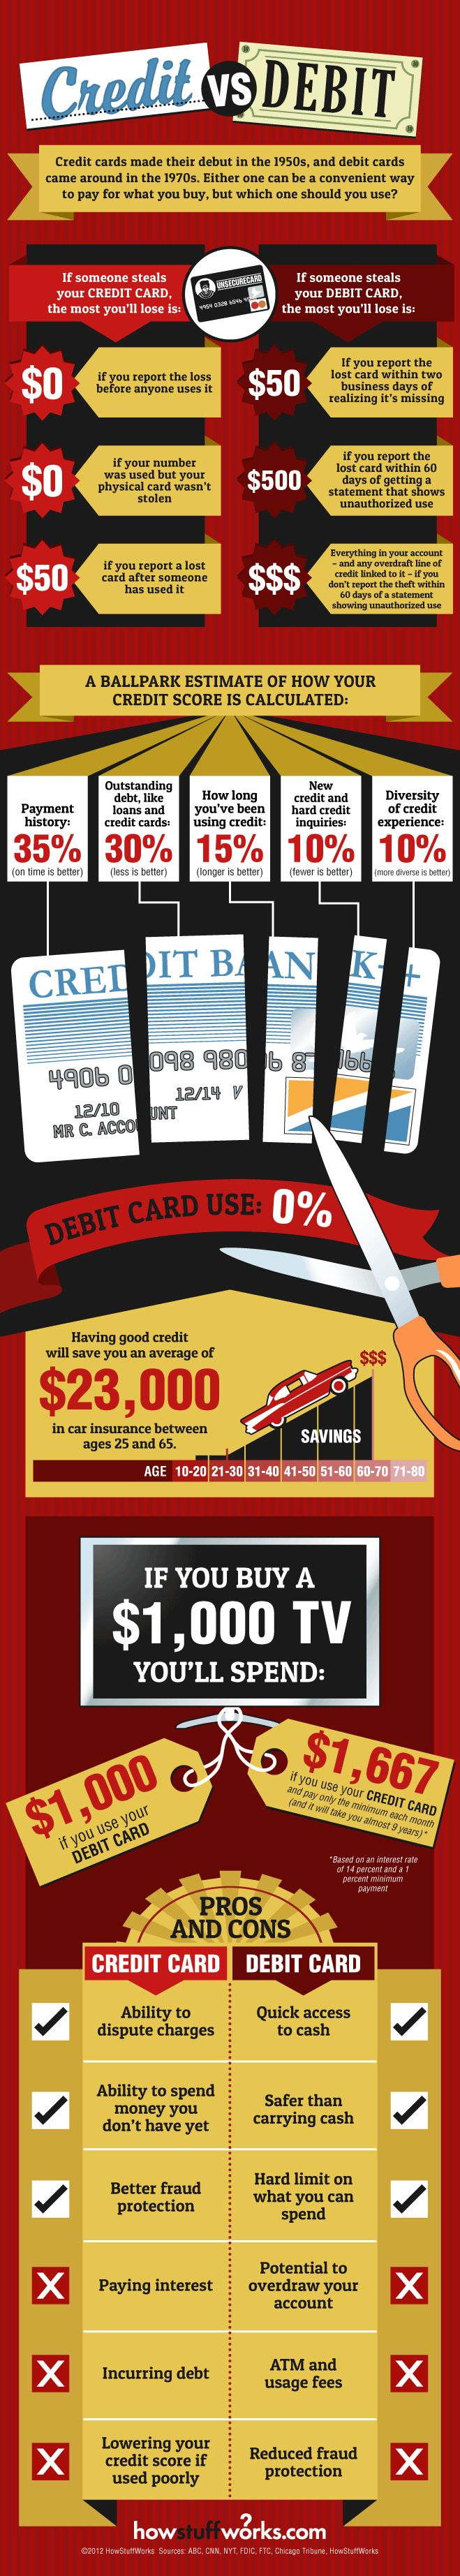 credit cards vs debit